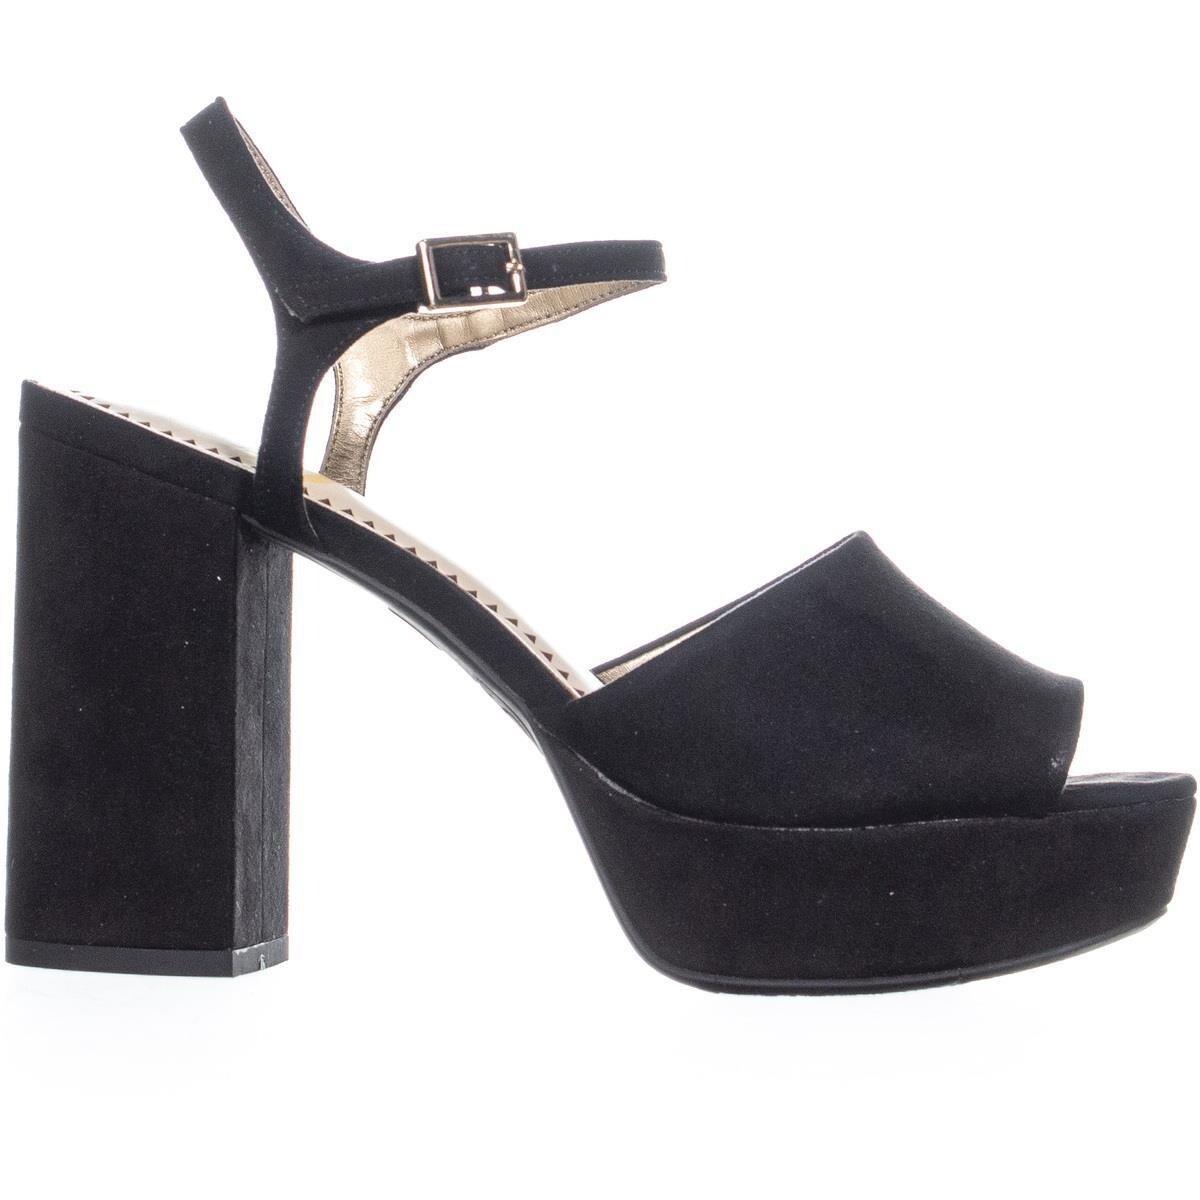 0c0f9a089089 Shop Circus by Sam Edelman Nakita Platform Block Heel Sandals